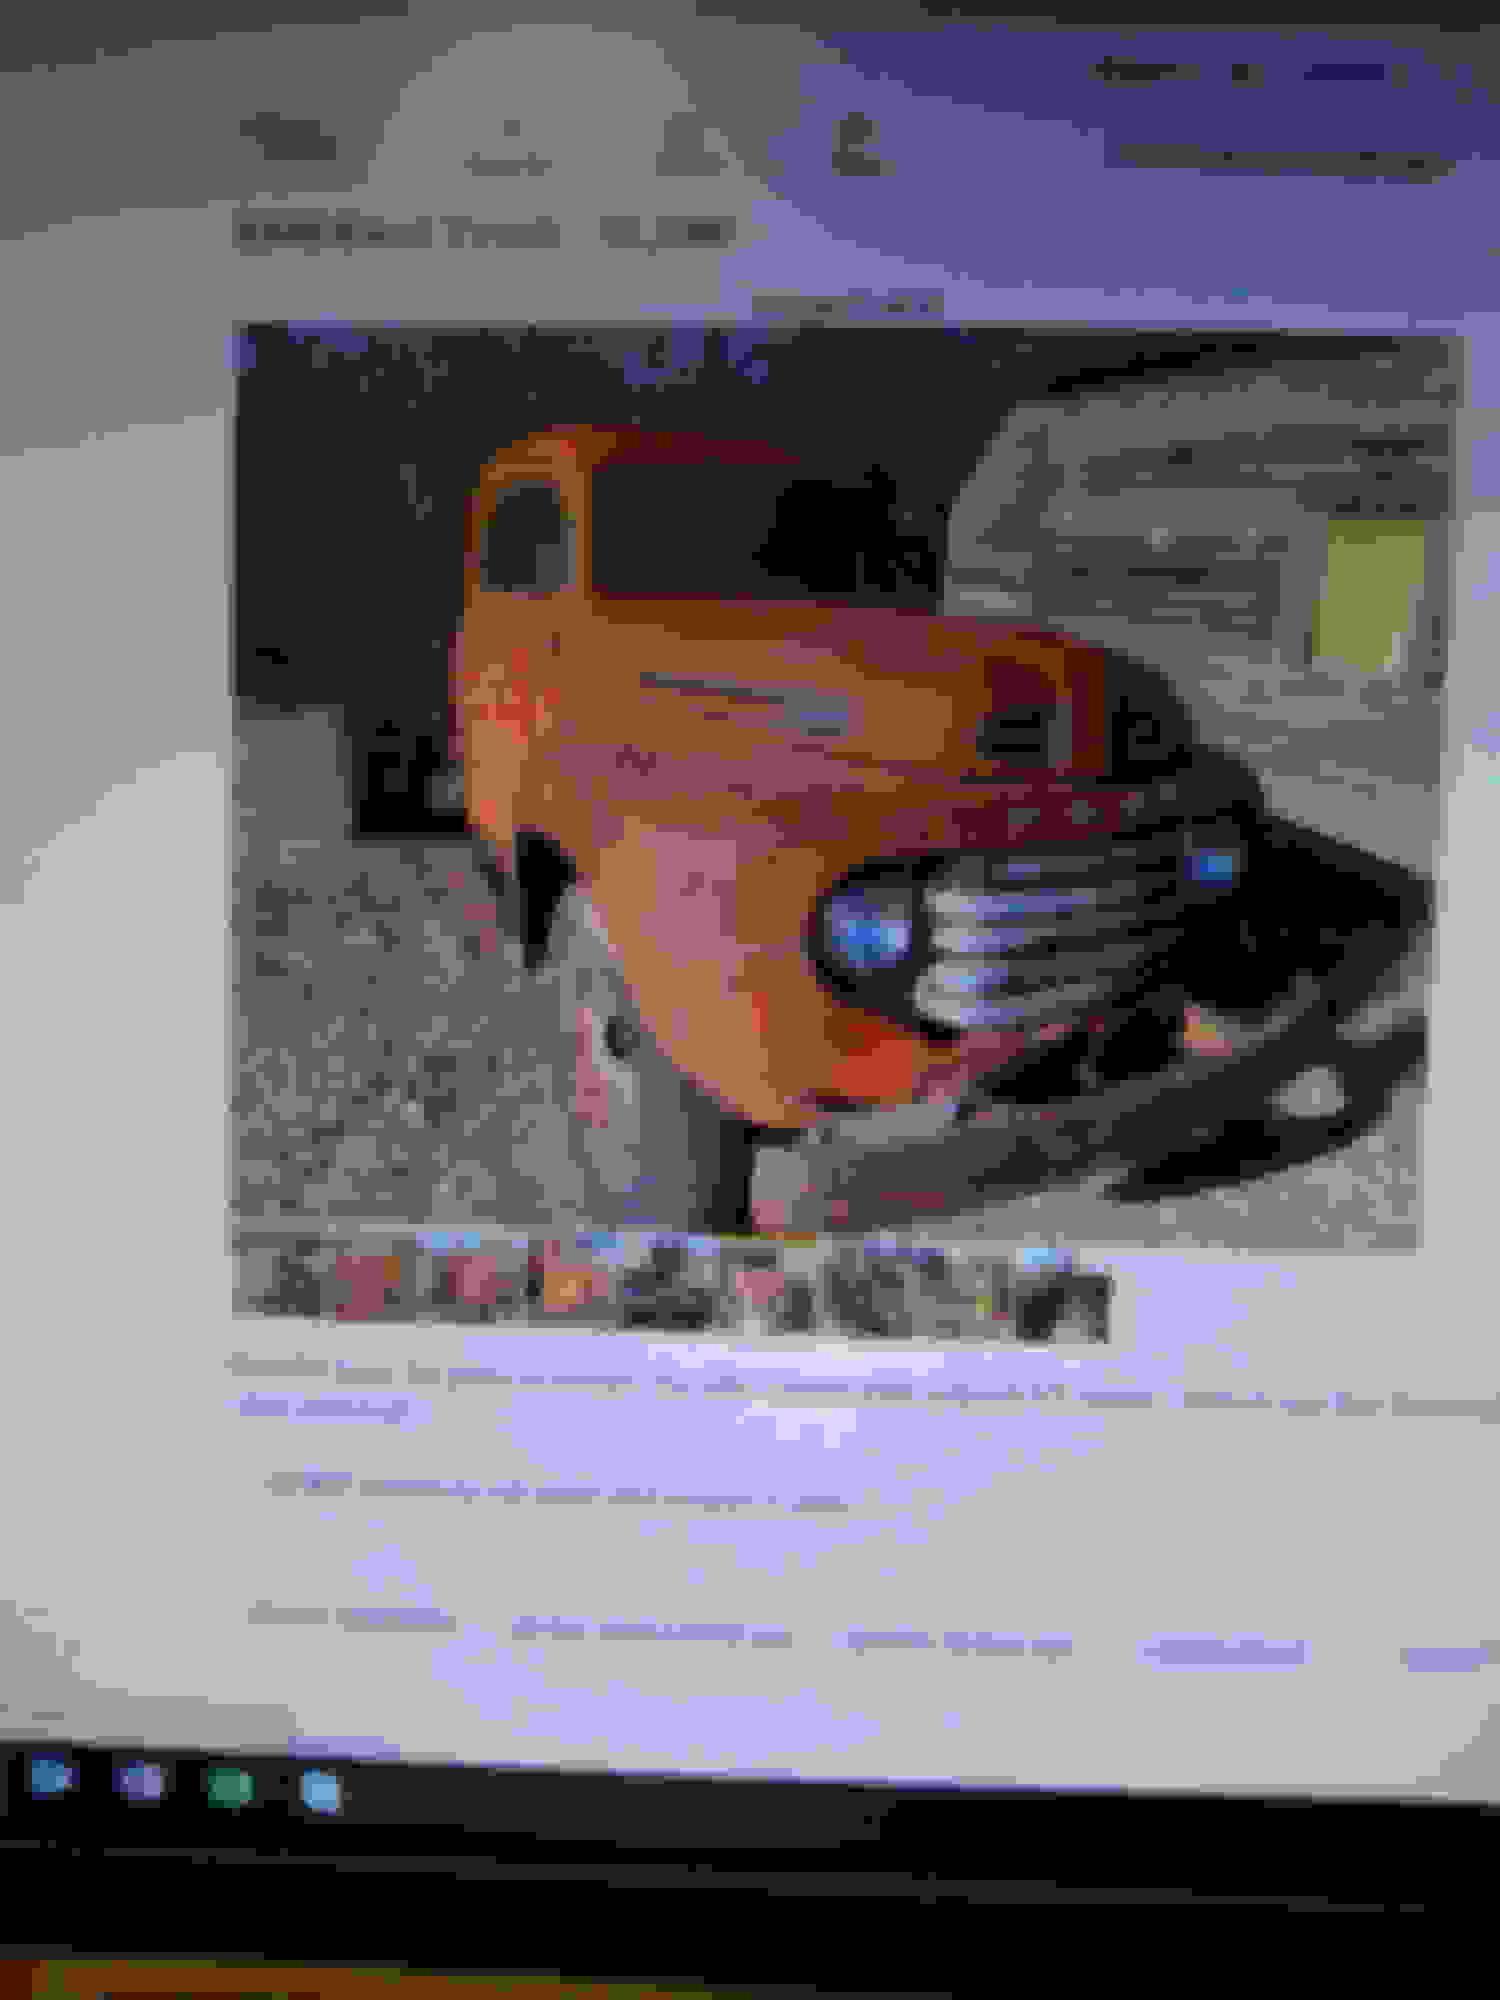 Craigslist trks - Ford Truck Enthusiasts Forums